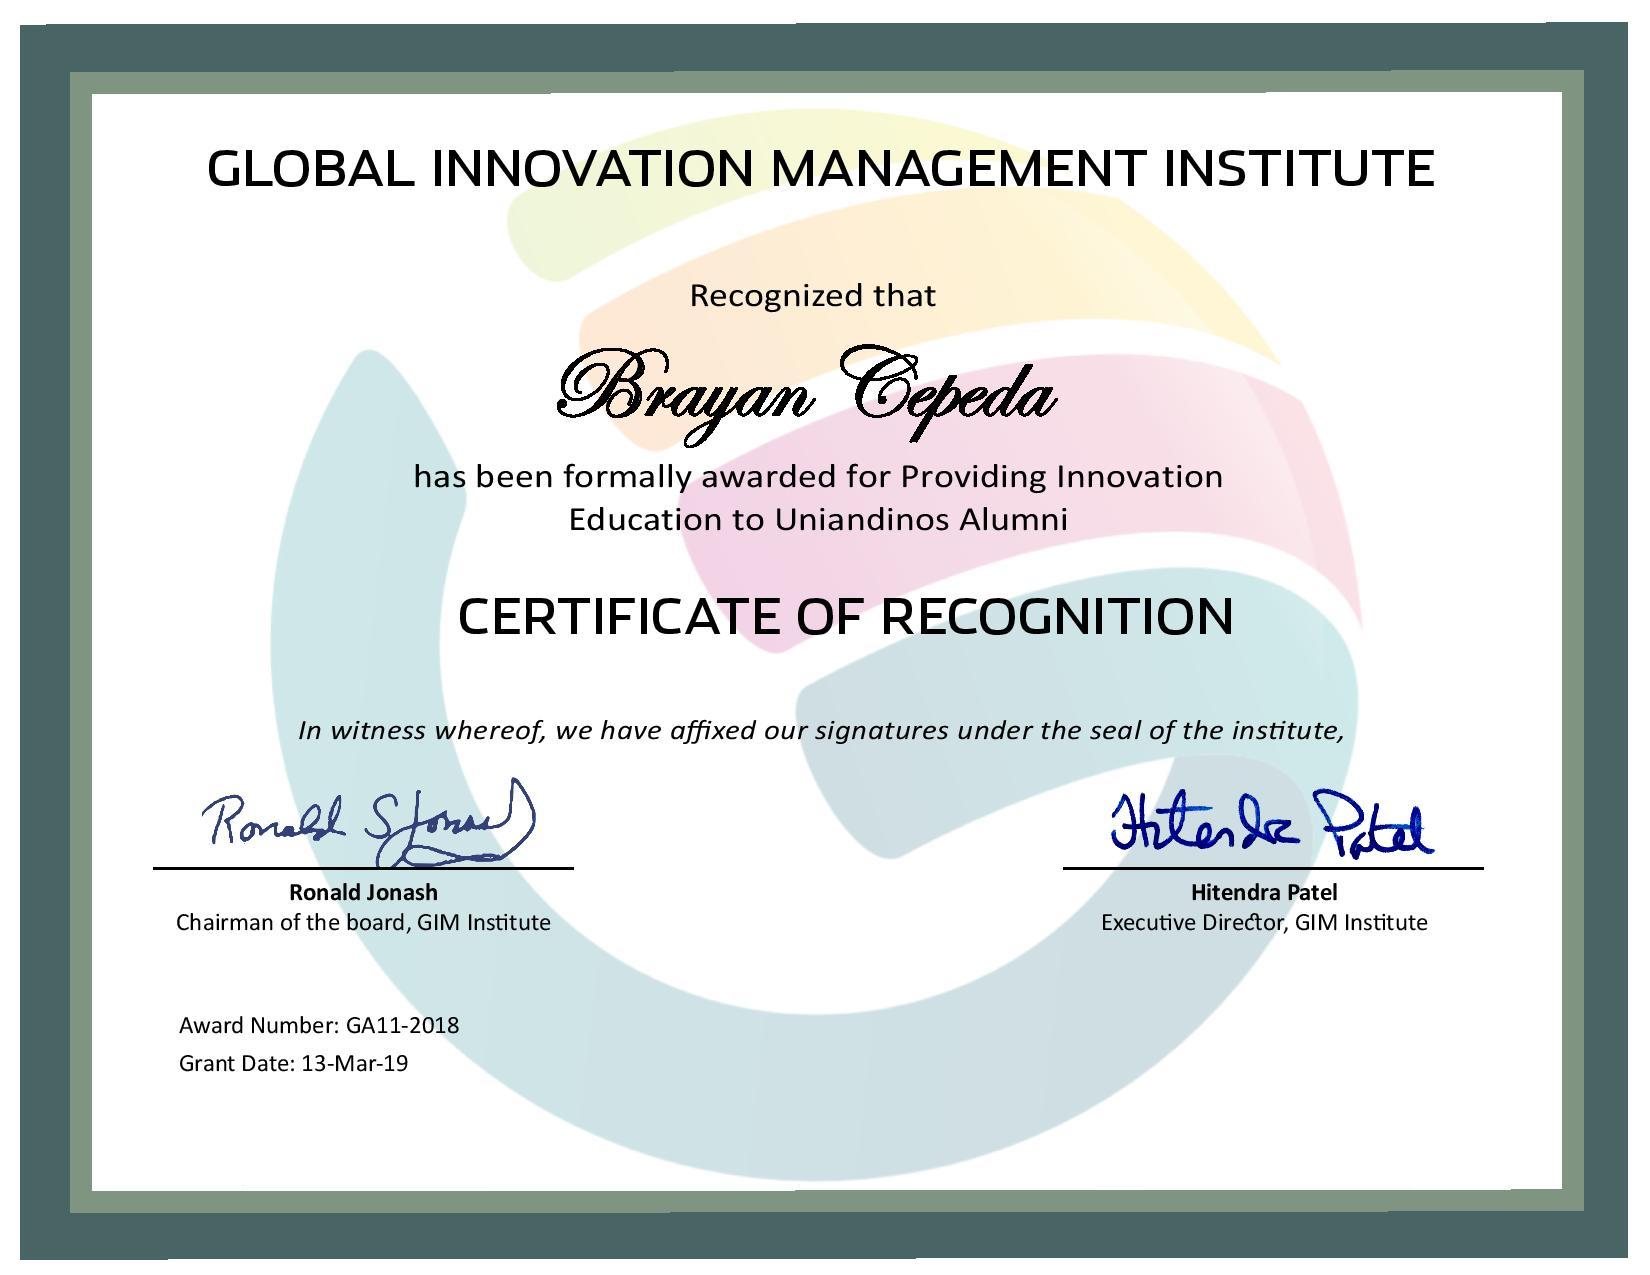 for Providing Innovation Education to Uniandinos Alumni